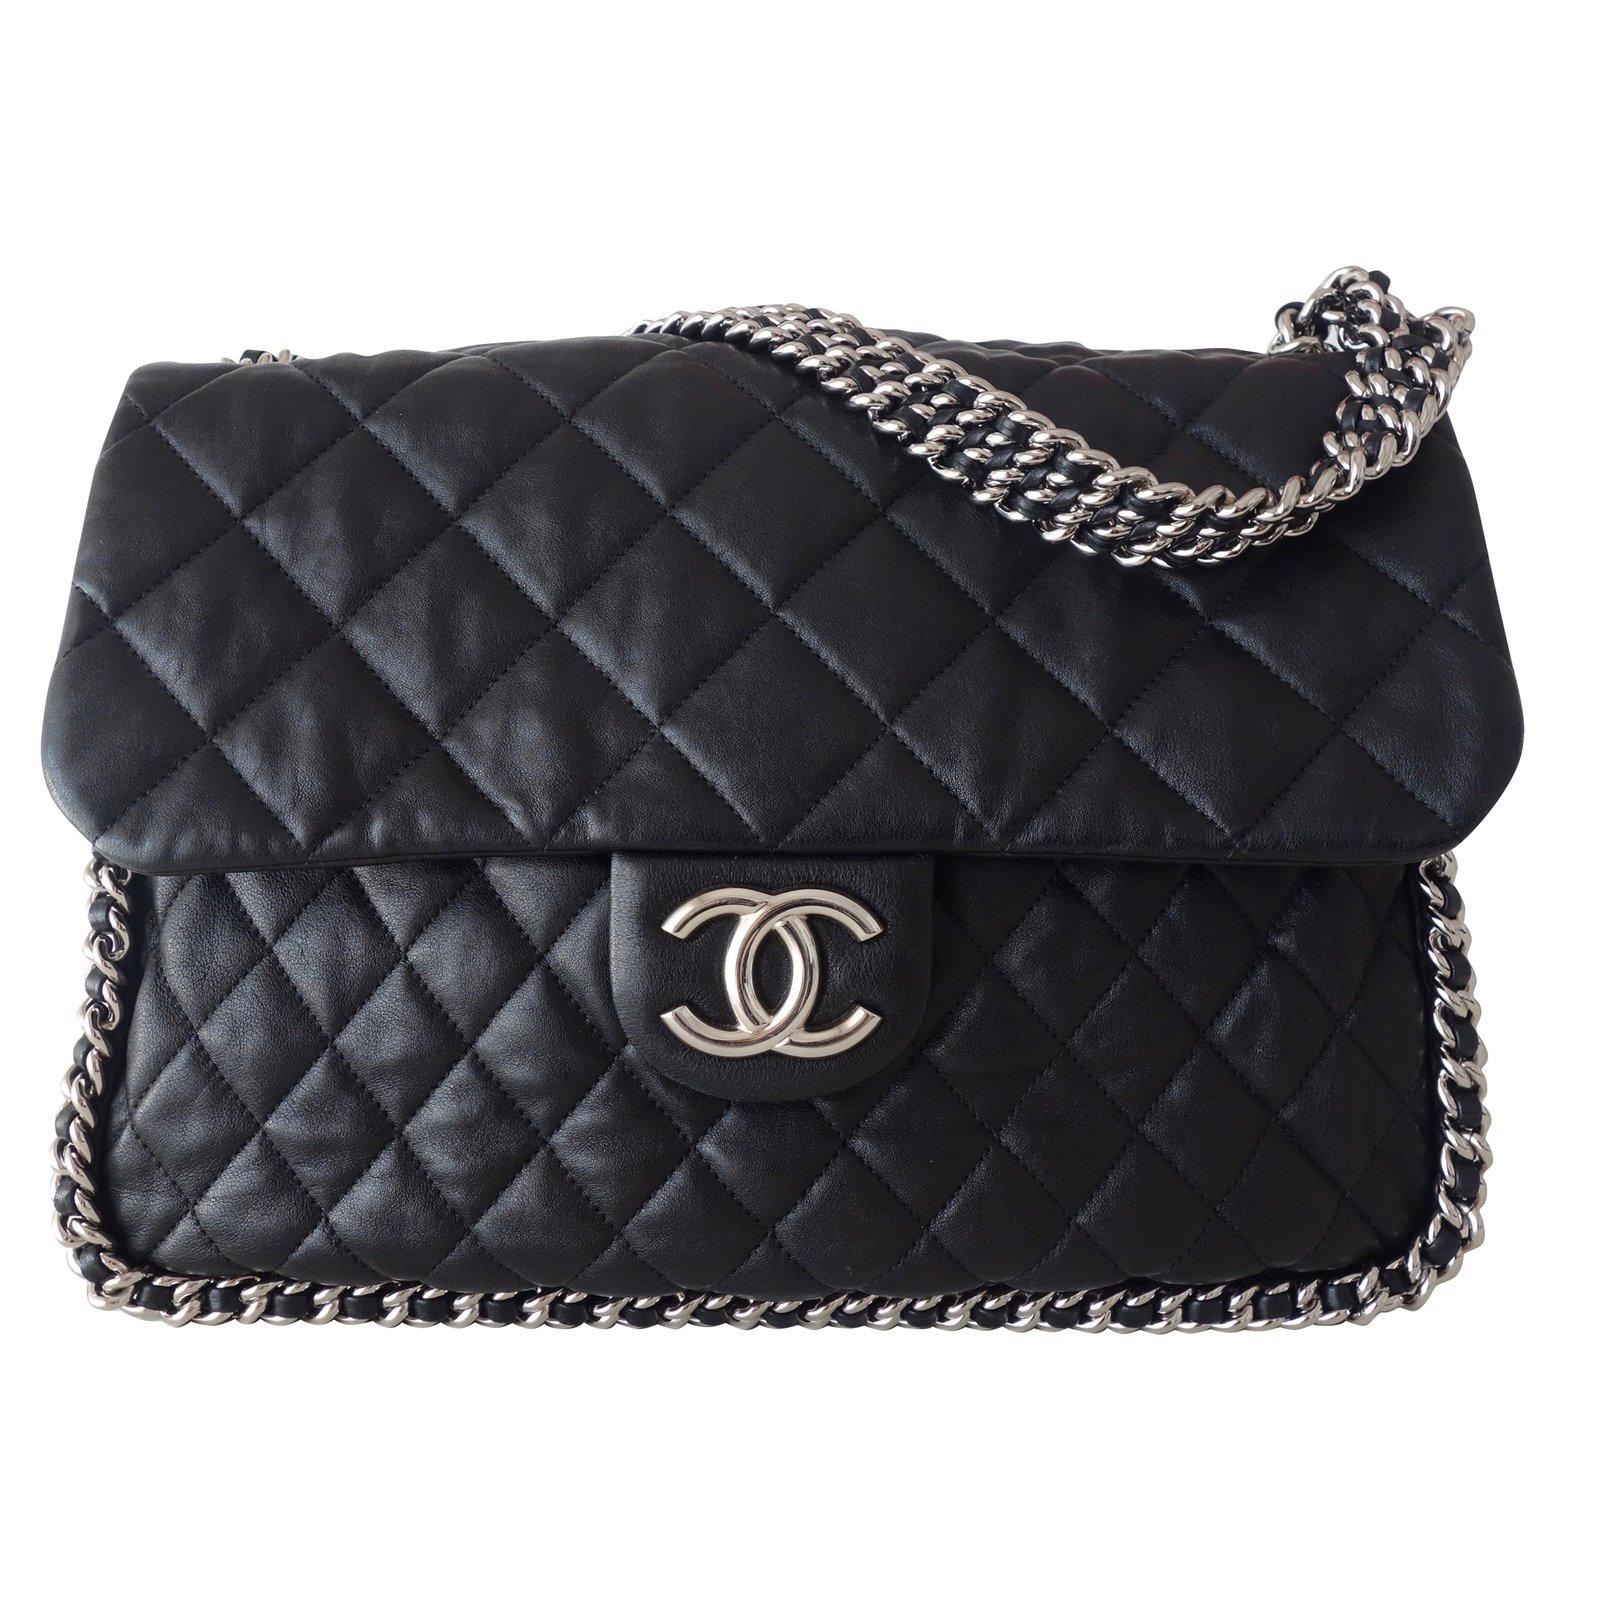 953934564f0f5b Chanel CHANEL JUMBO CHAIN AROUND Handbags Leather Black ref.57559 ...